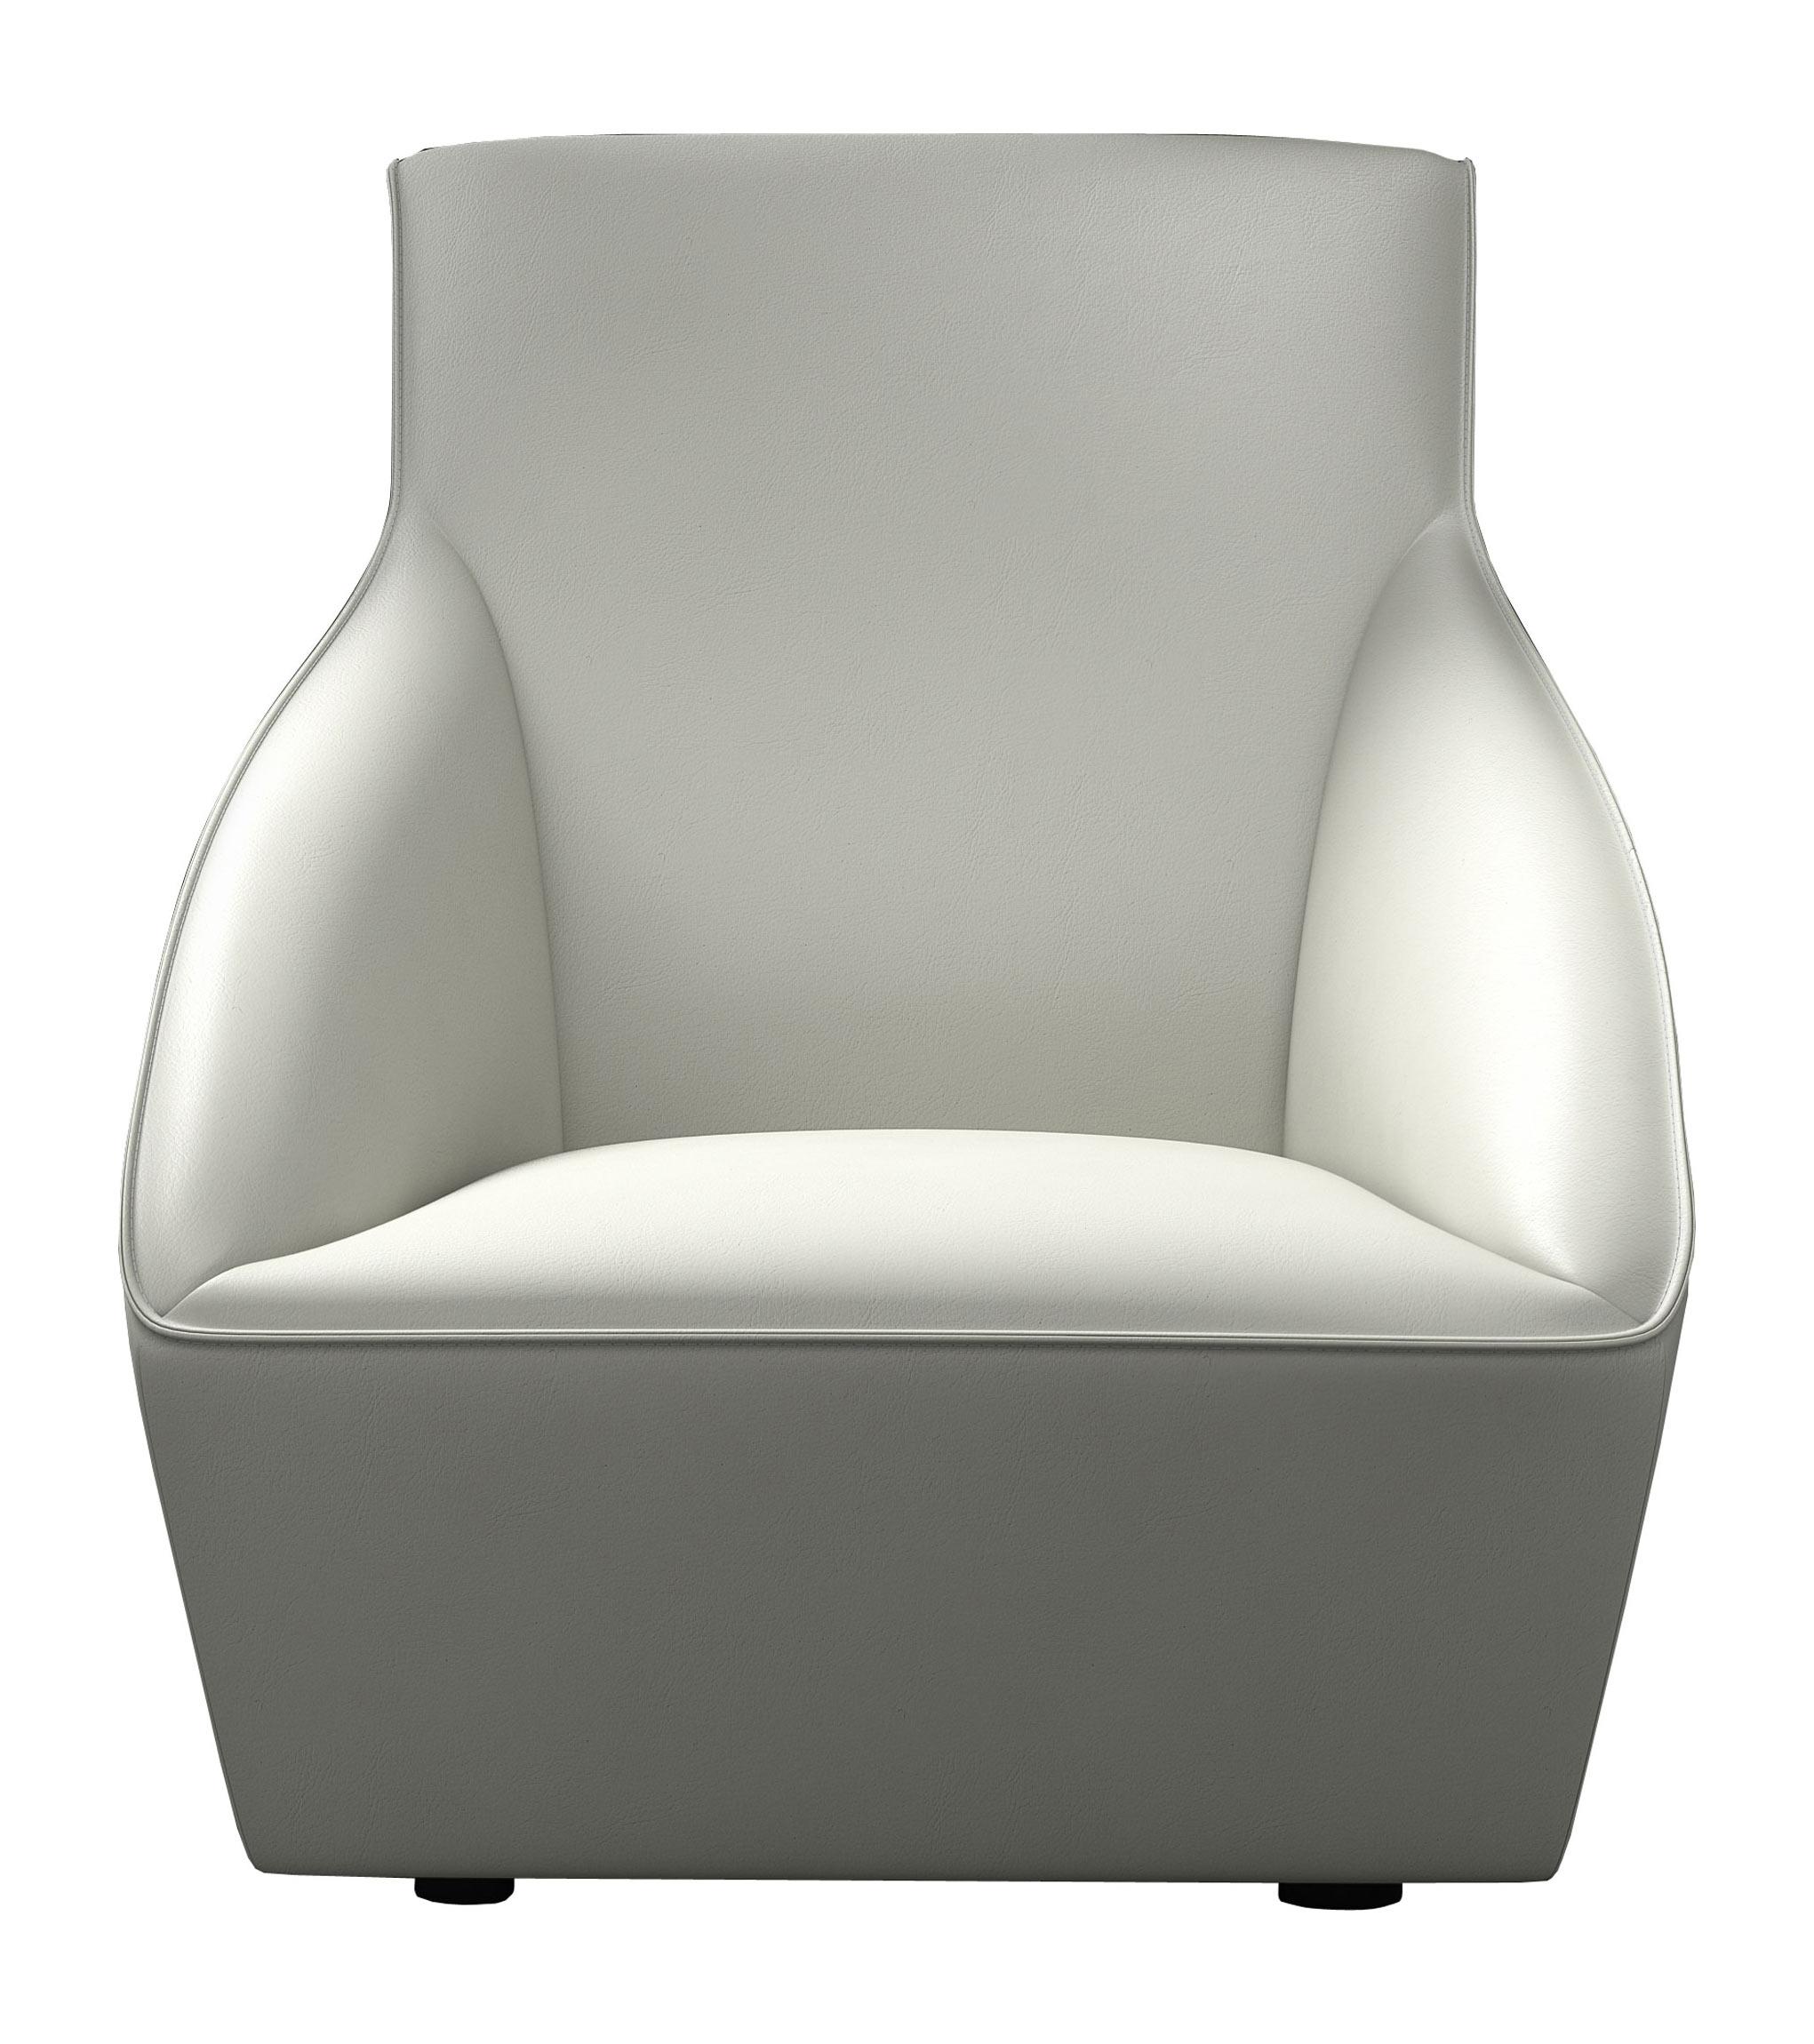 Enjoyable Forsyth Lounge Chair White By Modloft Machost Co Dining Chair Design Ideas Machostcouk